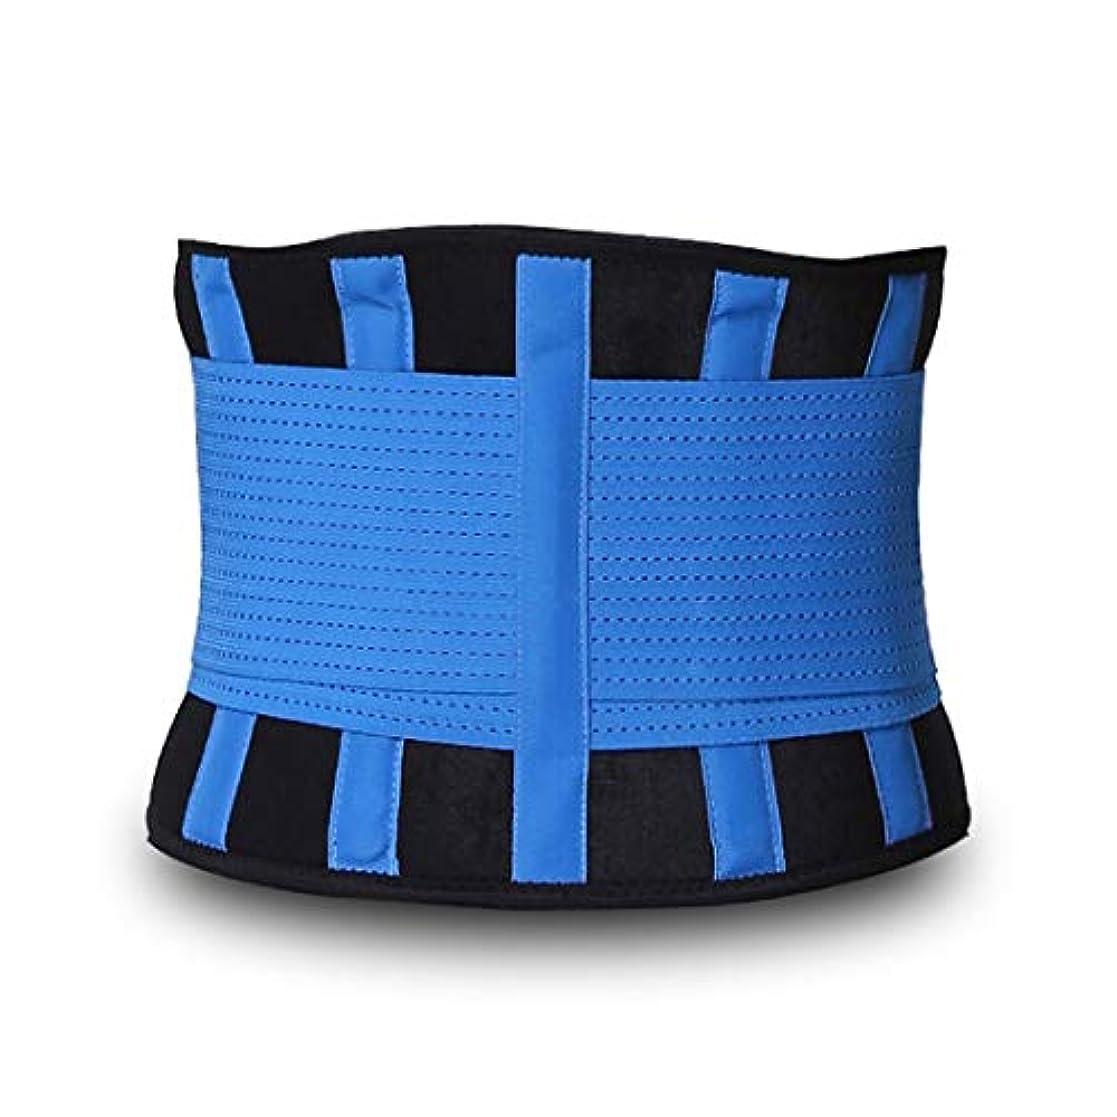 Danankan 新しいスタイルウエストベルト スポーツ腹部ウエストベルト ネオプレンウエストベルト 保護腰サポートベルト (色 : 青, サイズ : M)